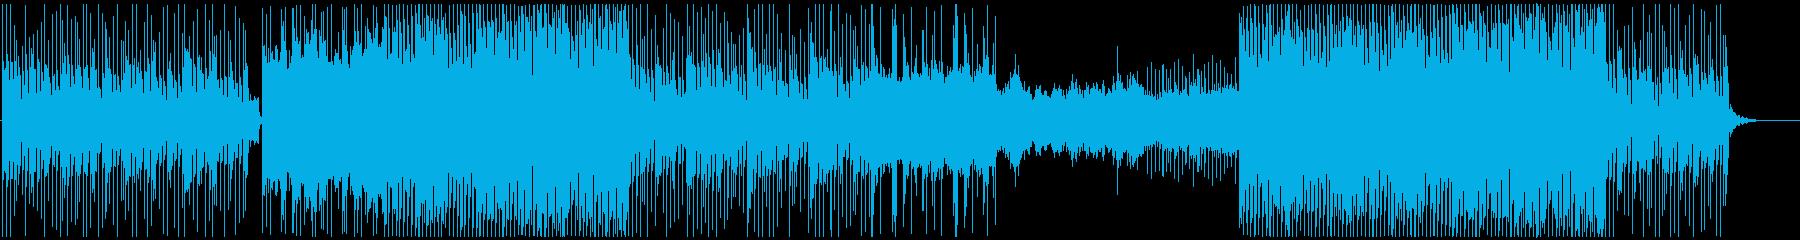 ■PV-デジタル-エレクトロ-SF-技術の再生済みの波形